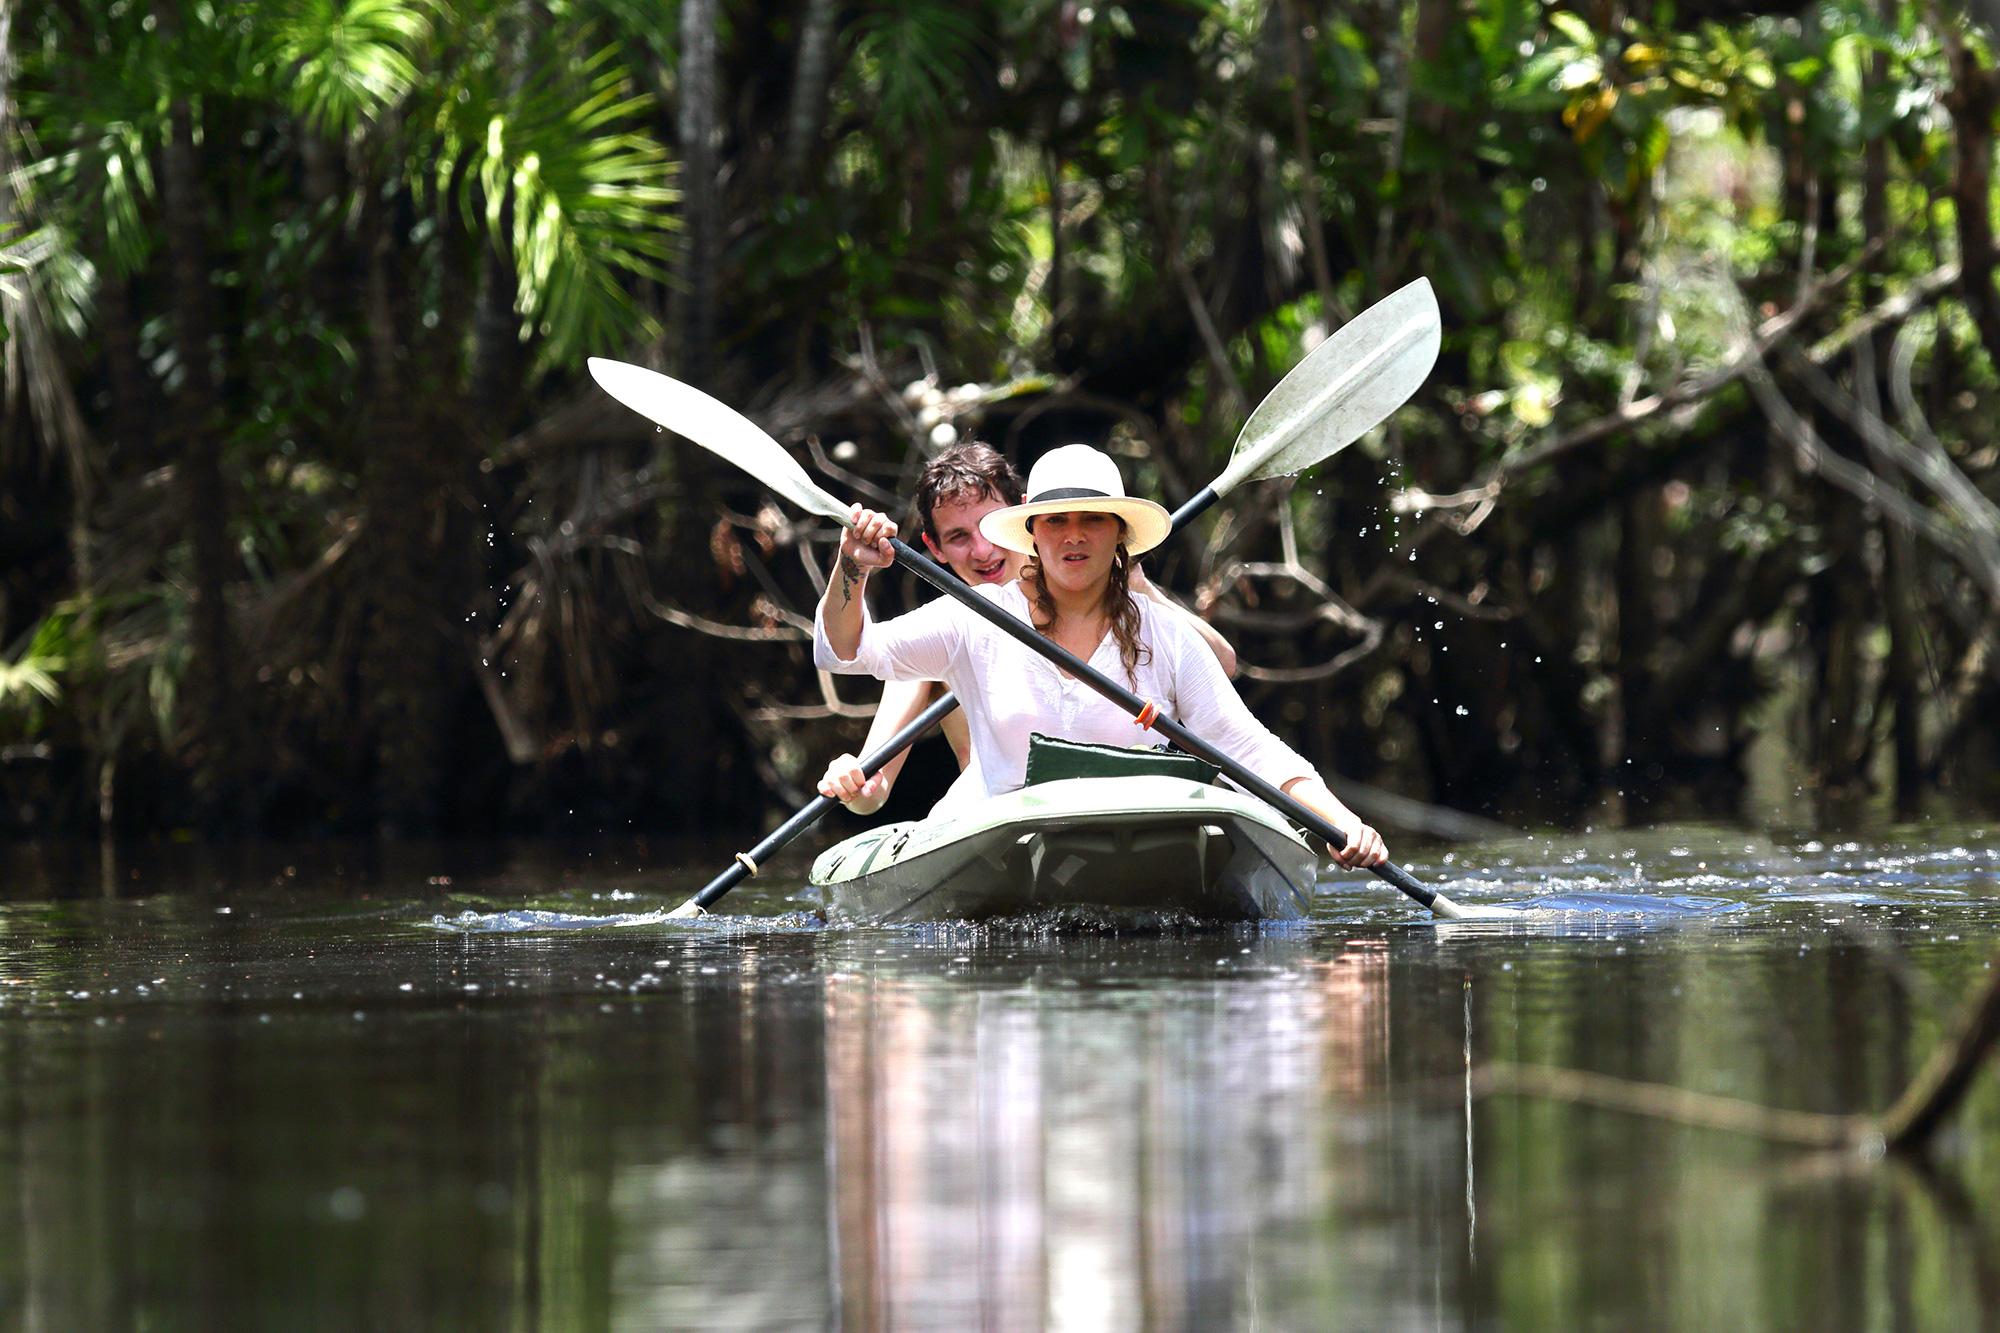 MV Anakonda - Exploring River Tributaries